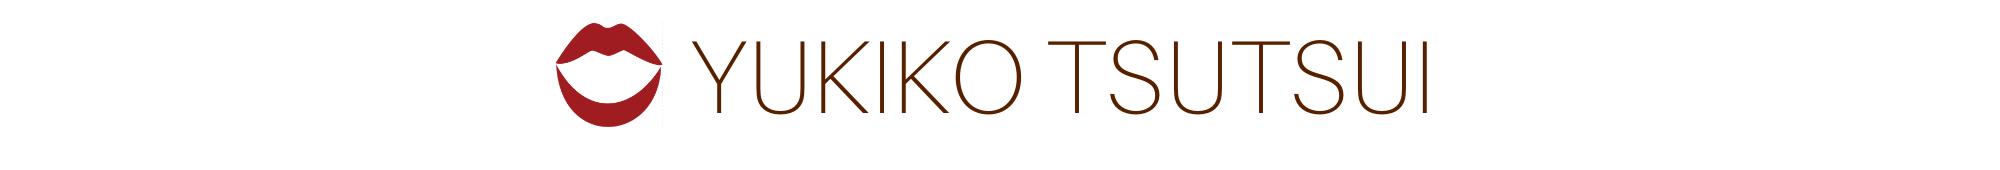 Yukiko Tsutsui Official Website